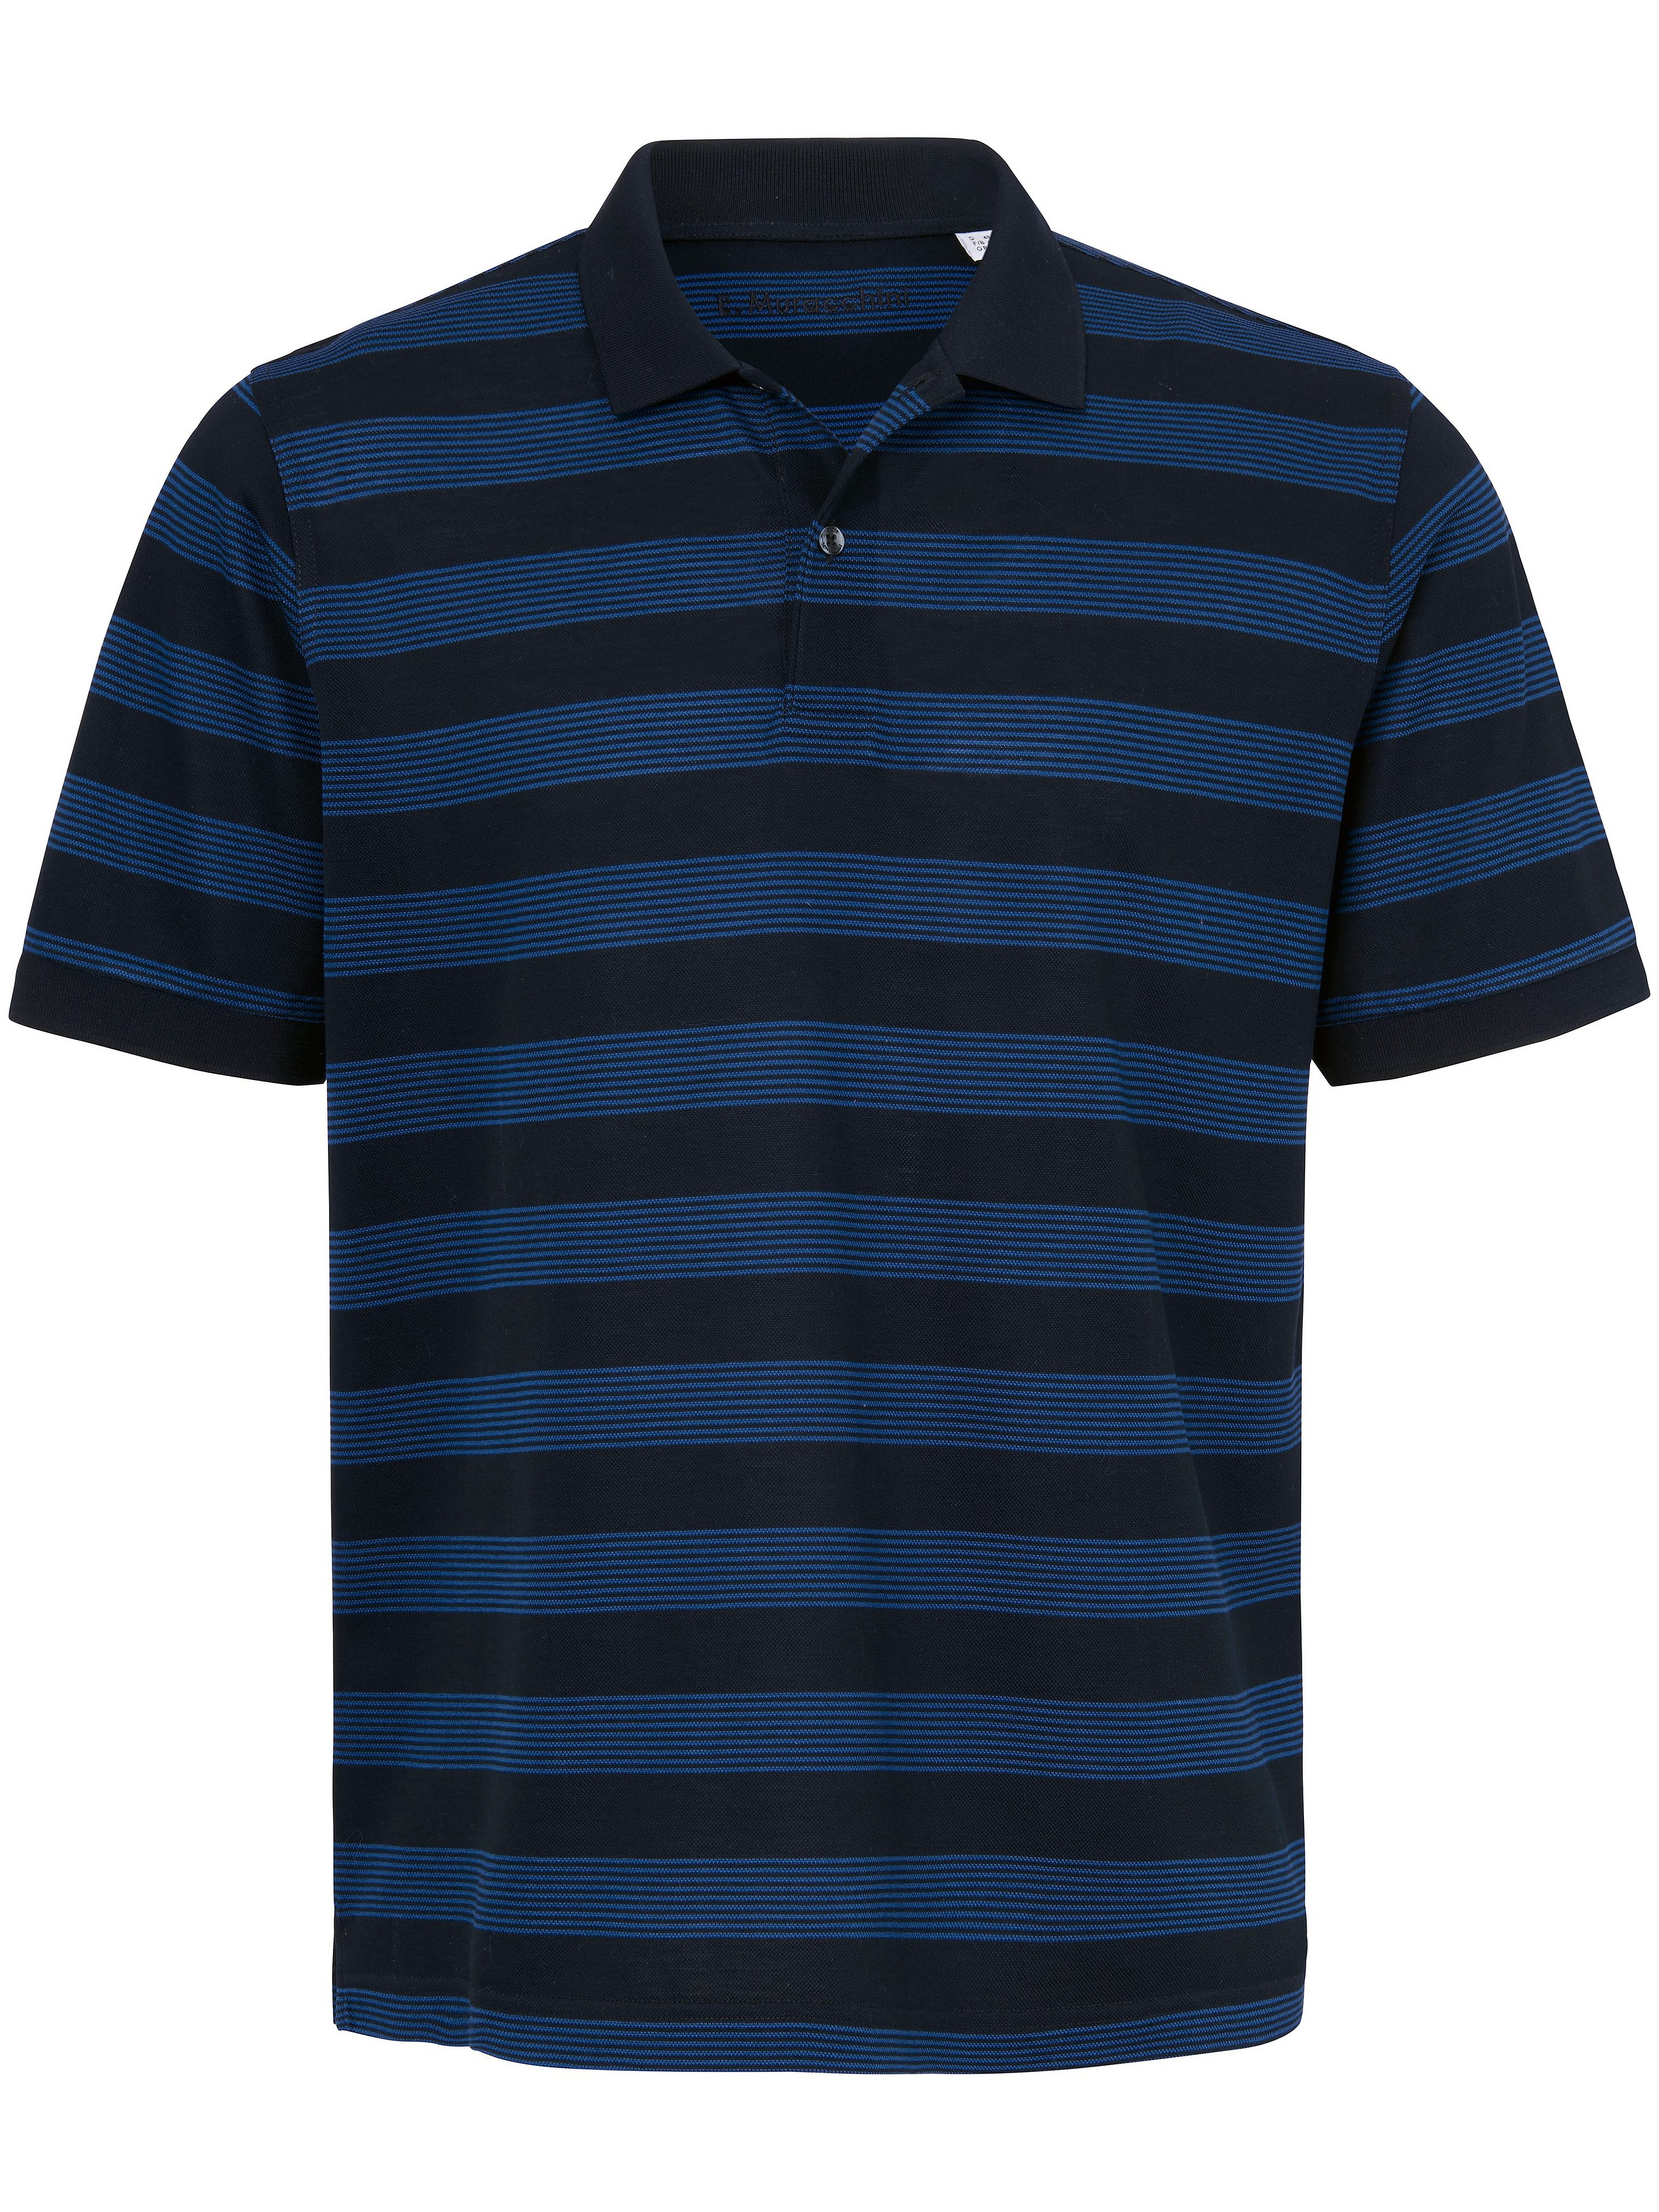 e.muracchini - Polo-Shirt  blau